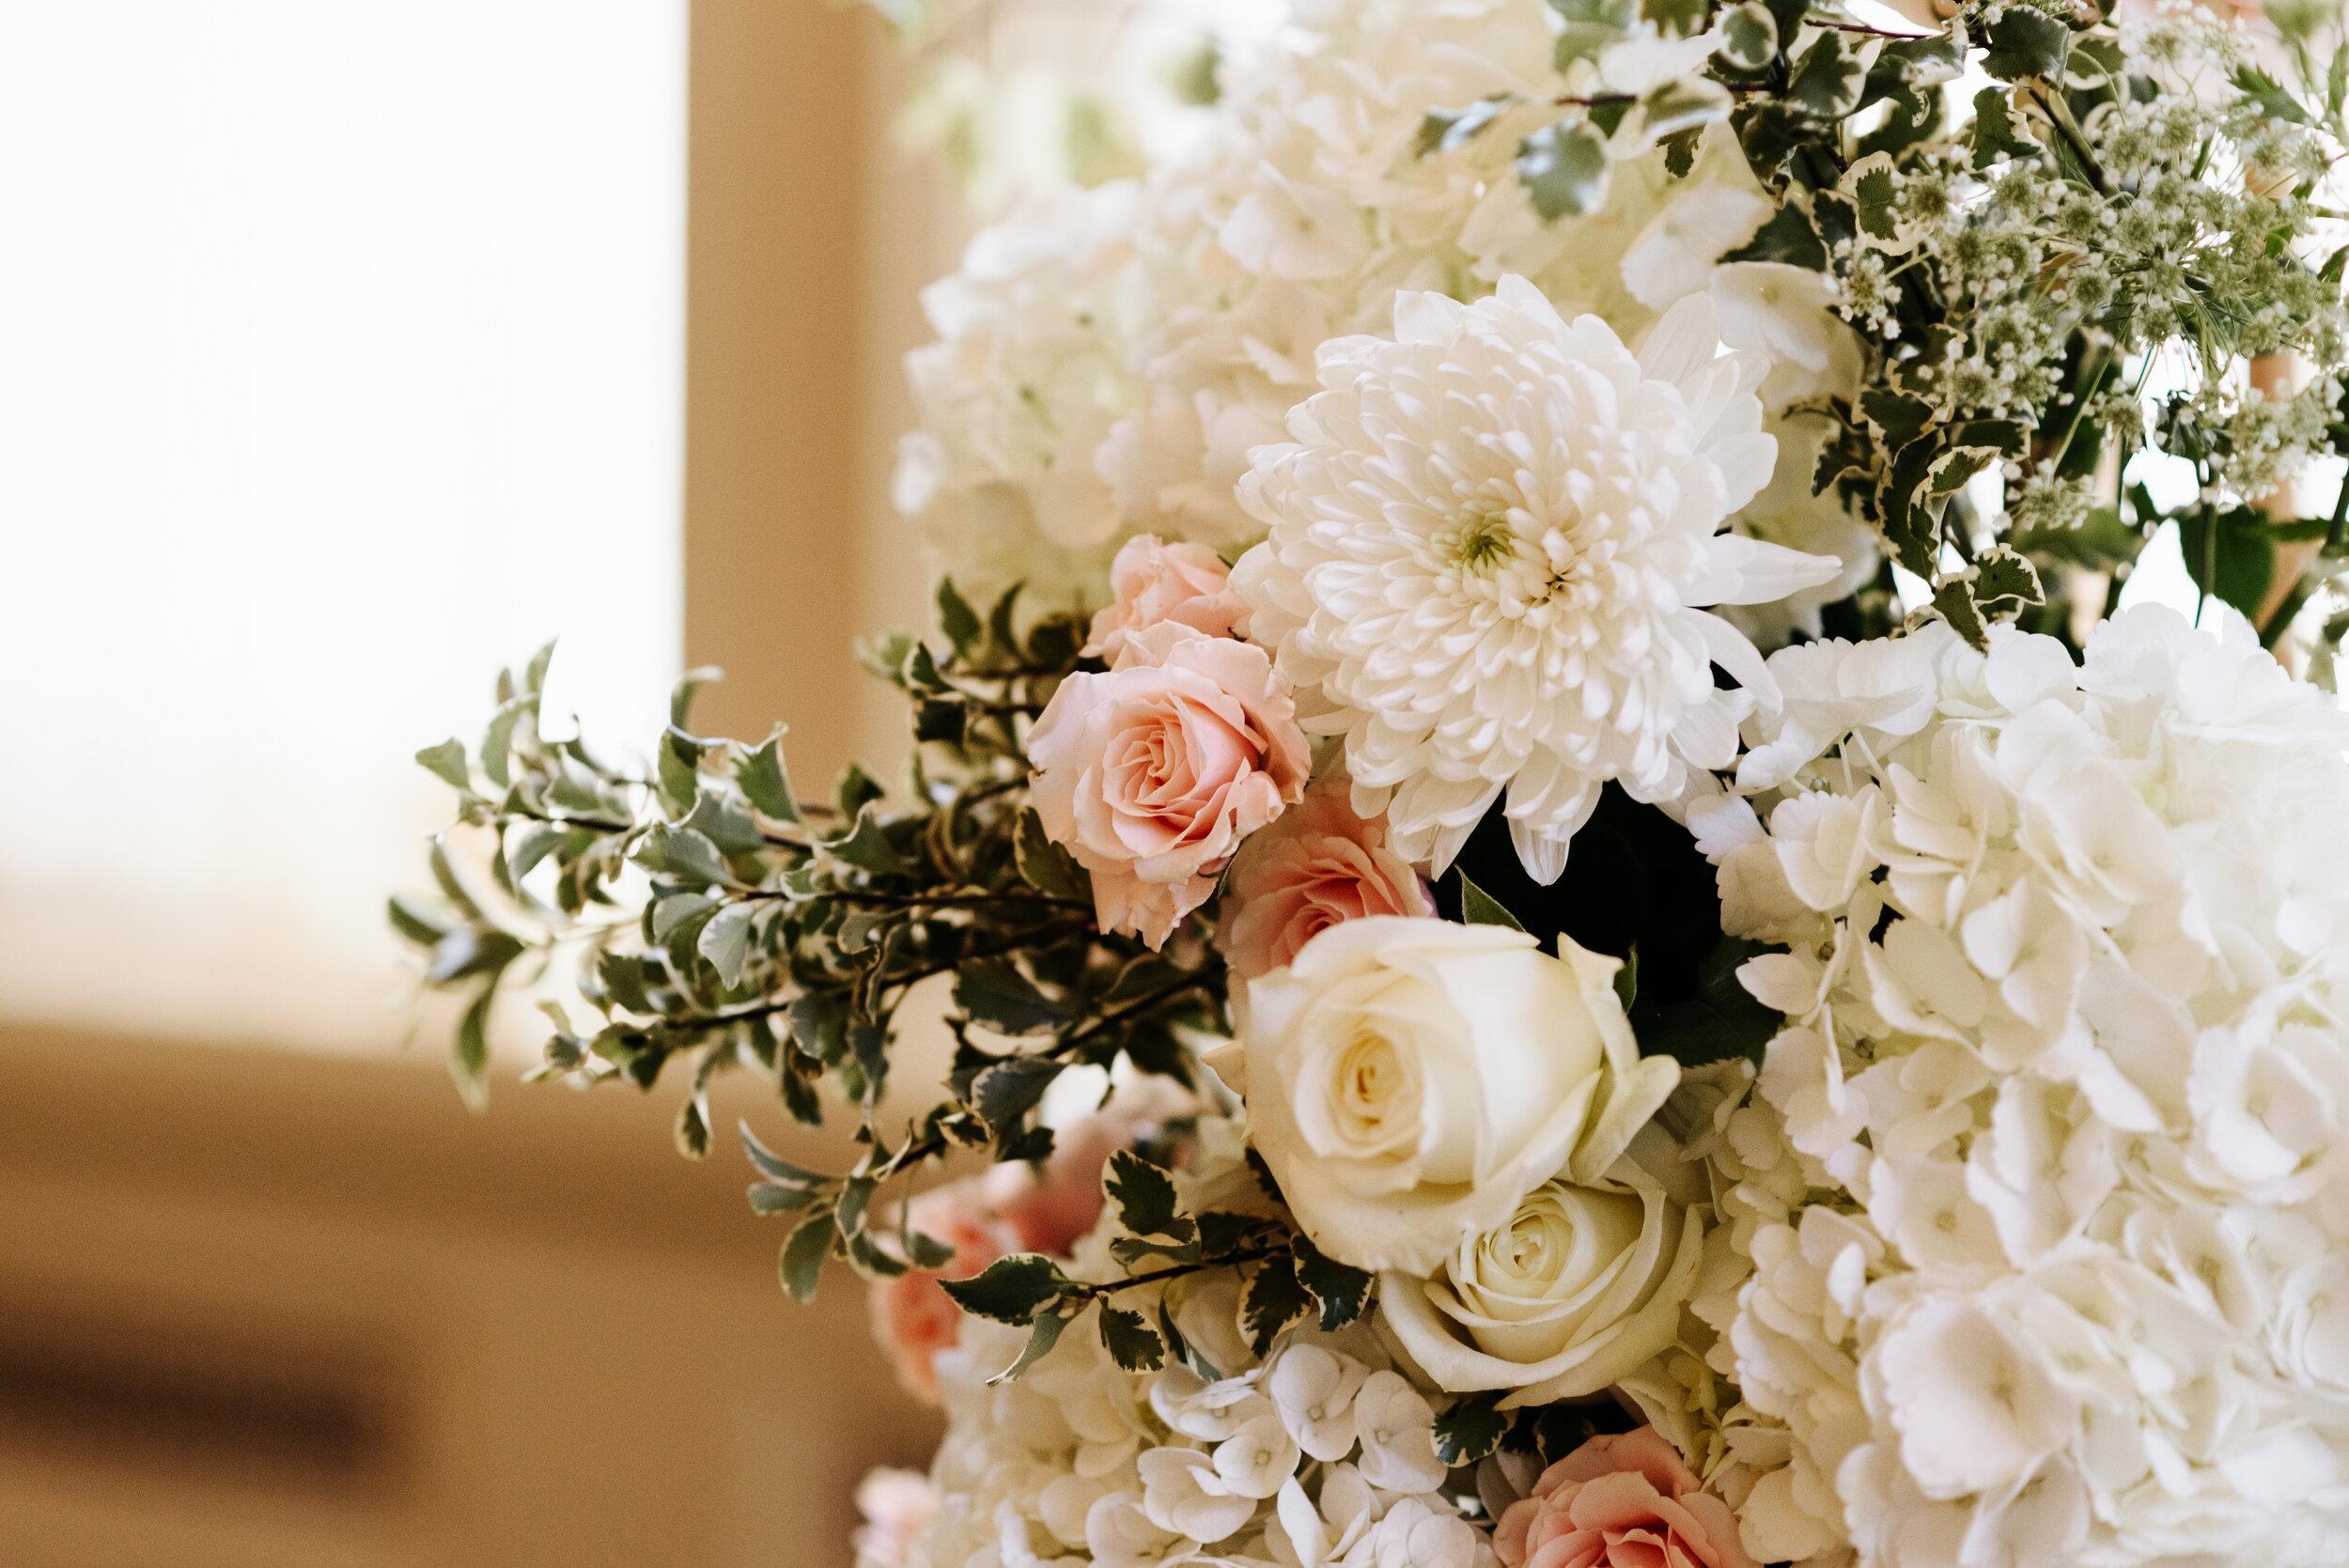 Cassie-Mrunal-Wedding-Quirk-Hotel-John-Marshall-Ballrooms-Richmond-Virginia-Photography-by-V-64.jpg